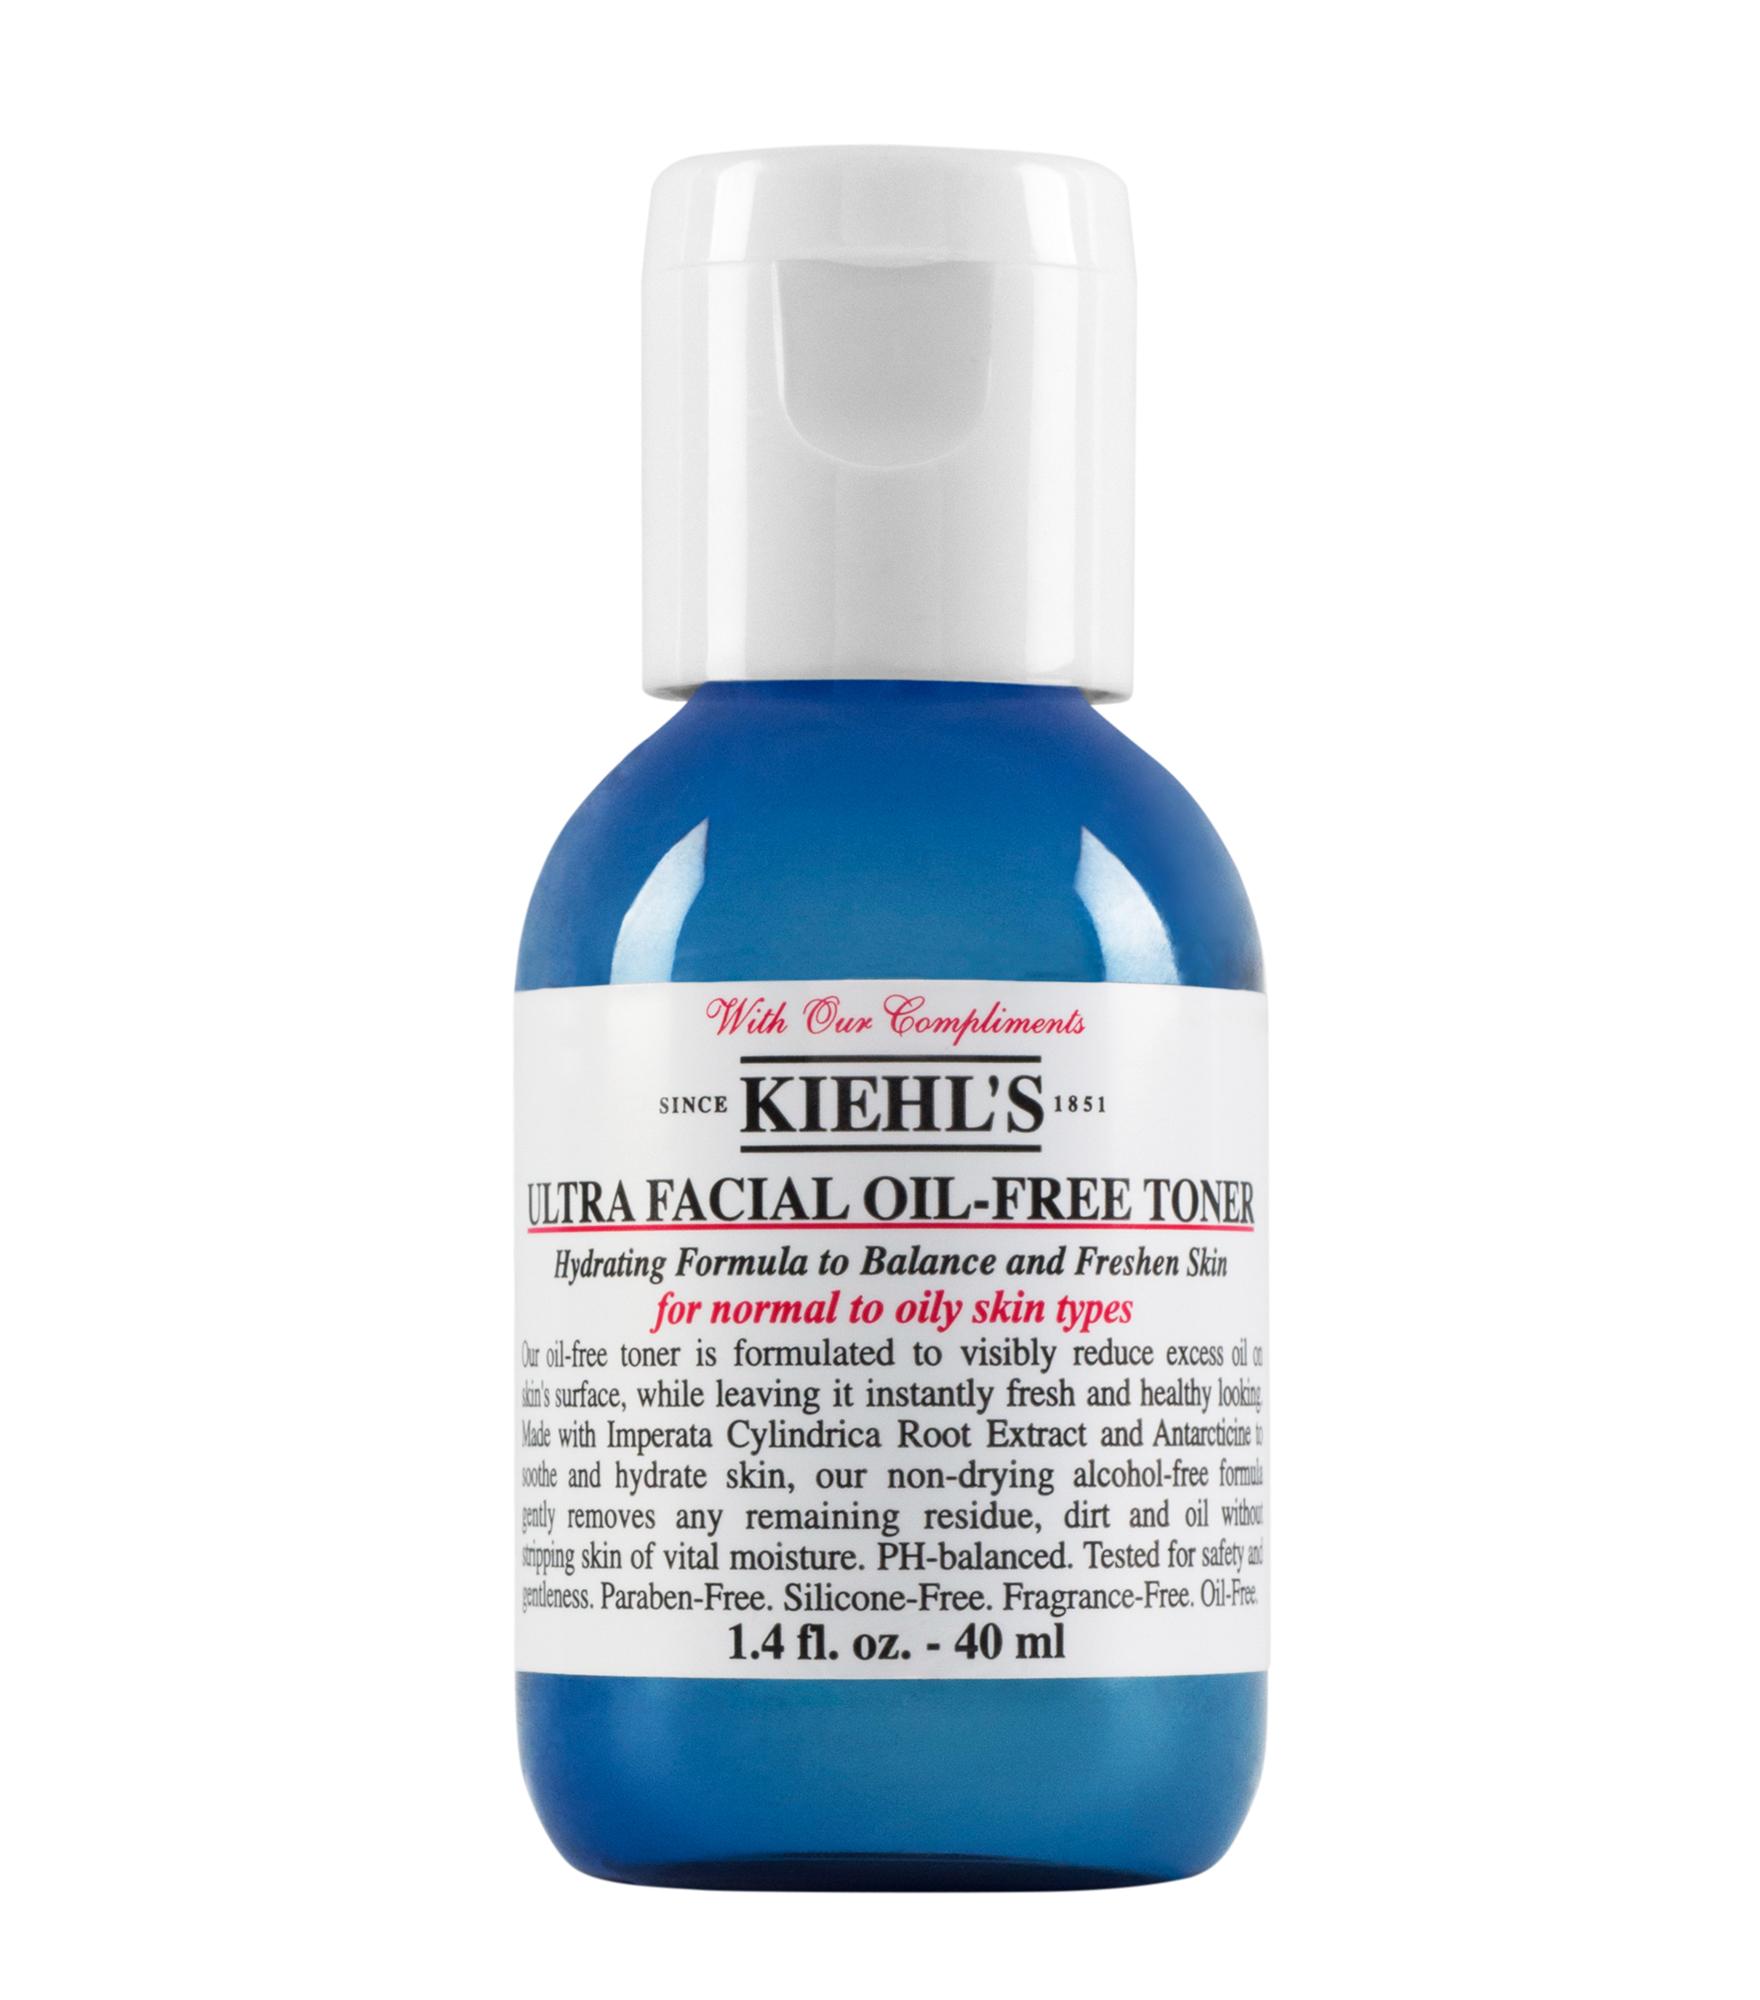 Ultra Facial Oil-Free Toner by Kiehls #10